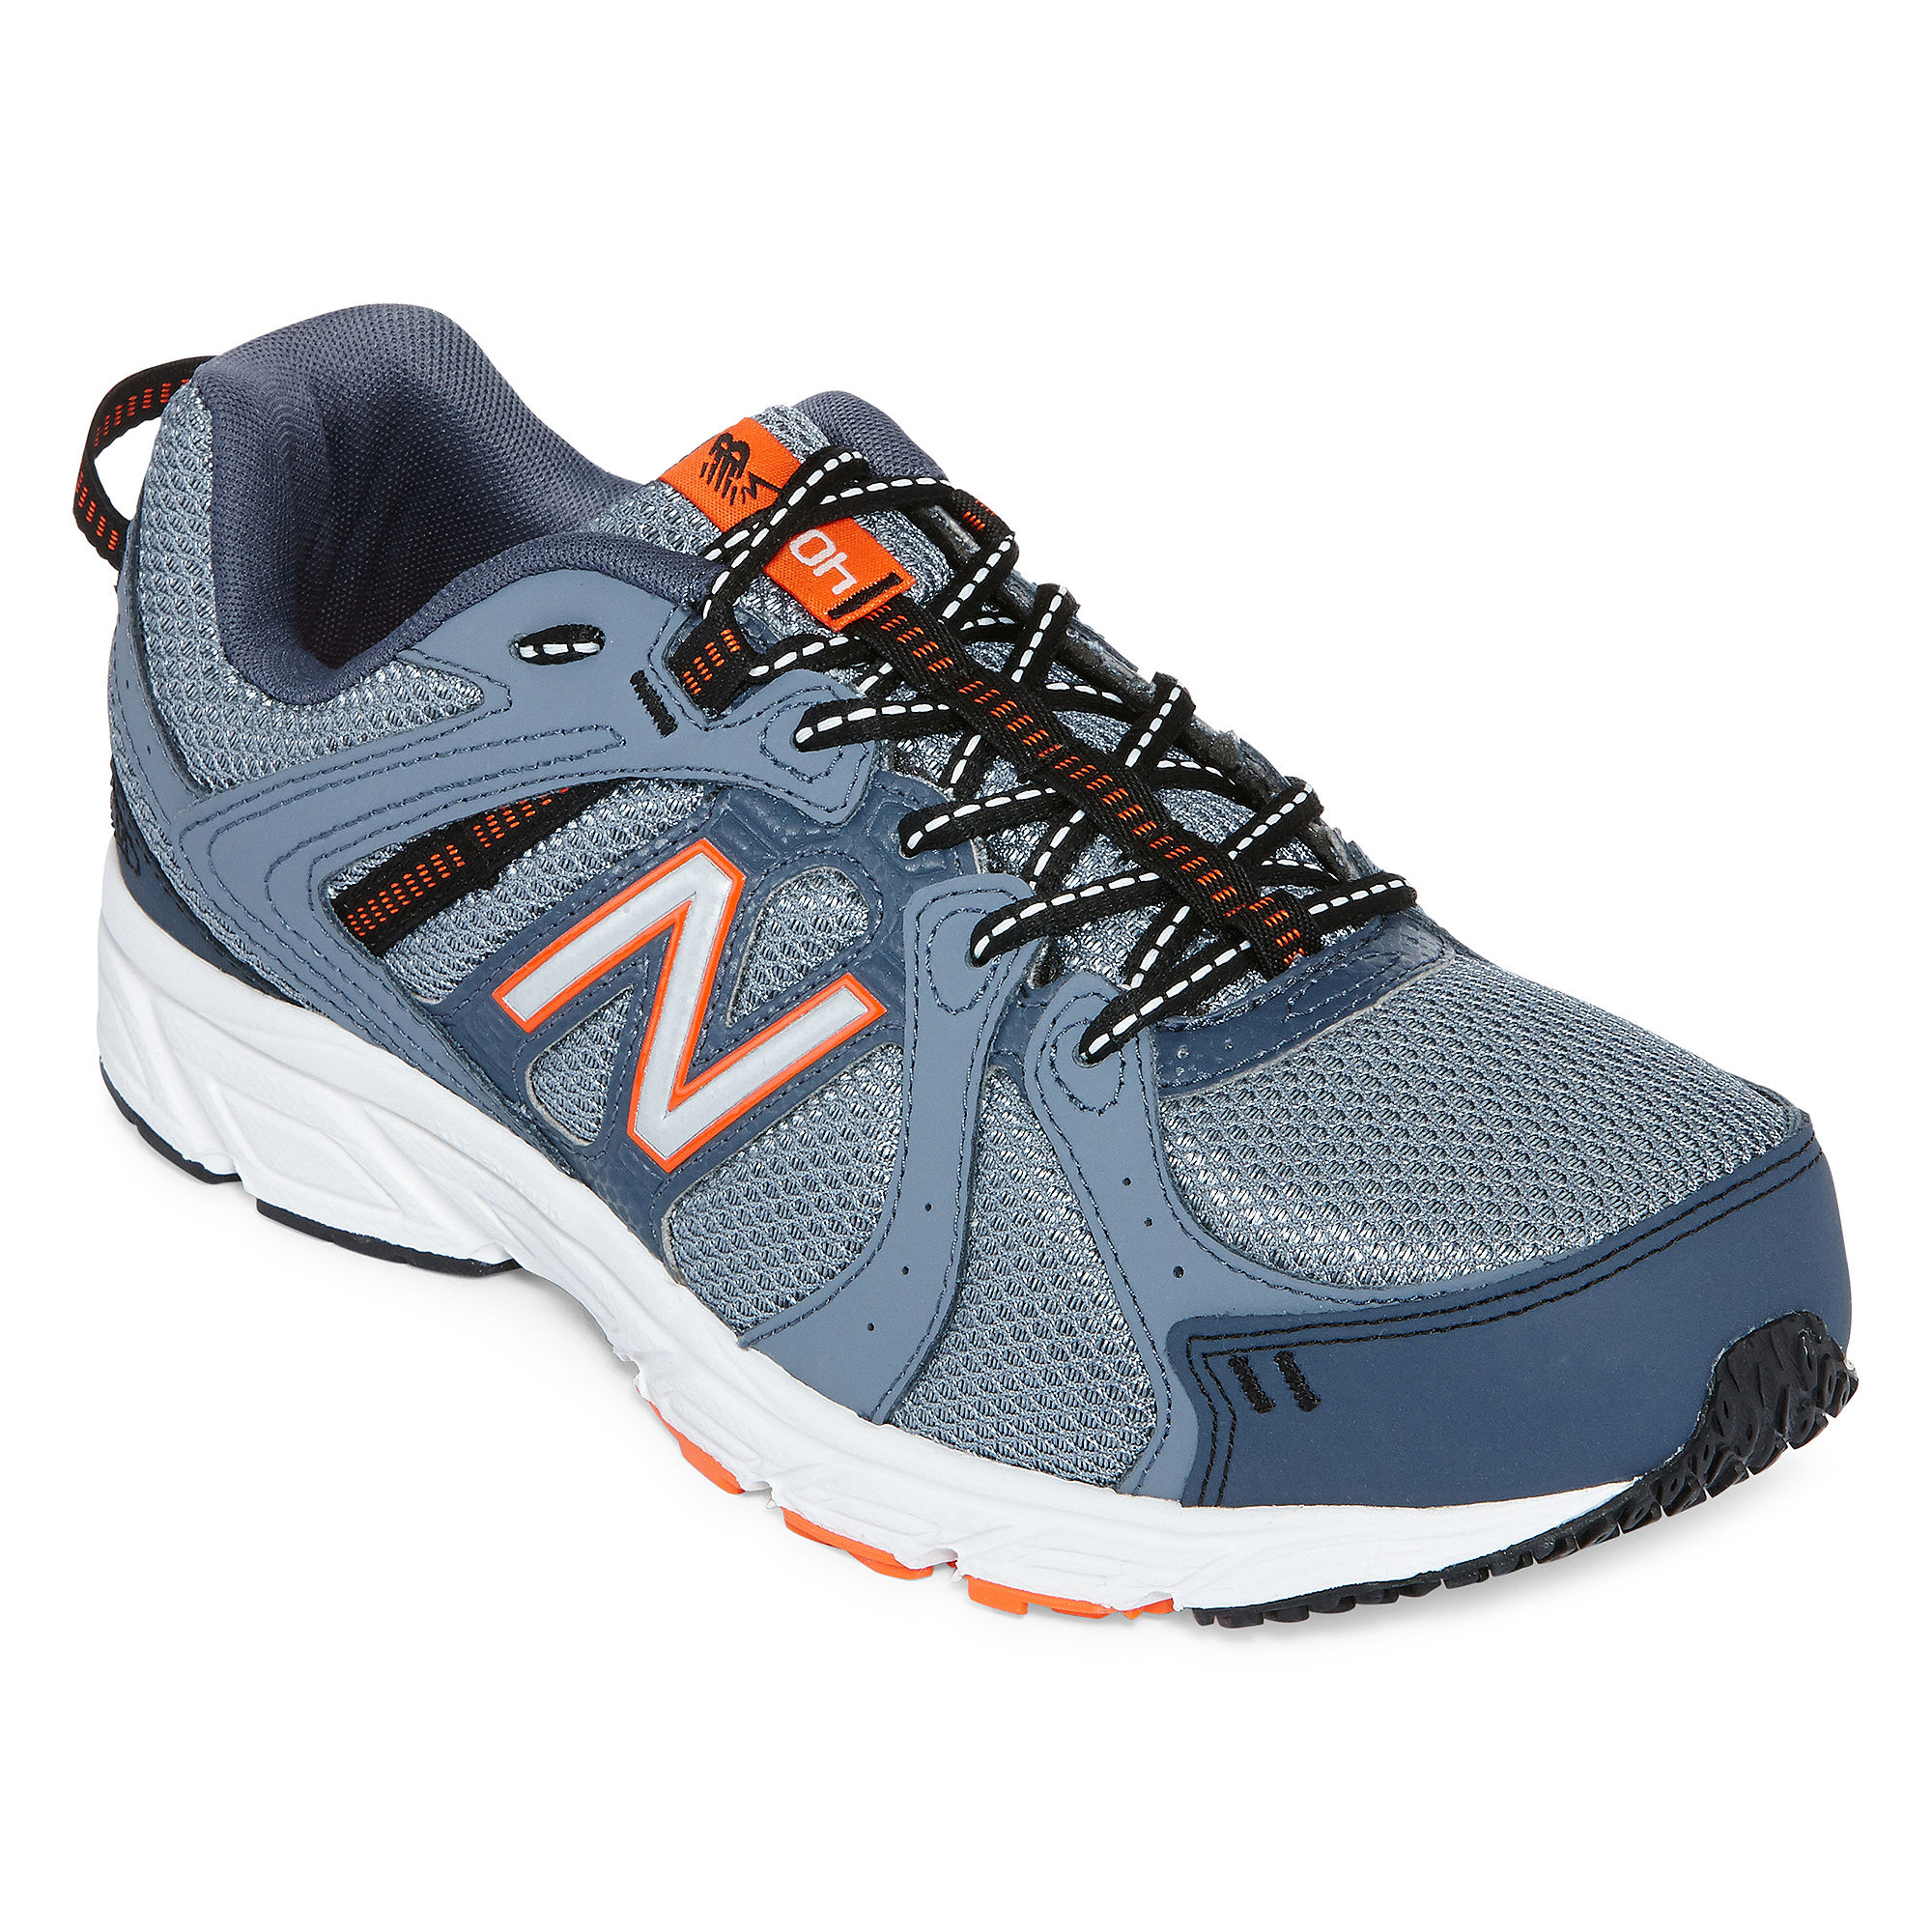 erótico muy agradable pierna  UPC 889116410589 - New Balance 402 Mens Running Shoes | upcitemdb.com